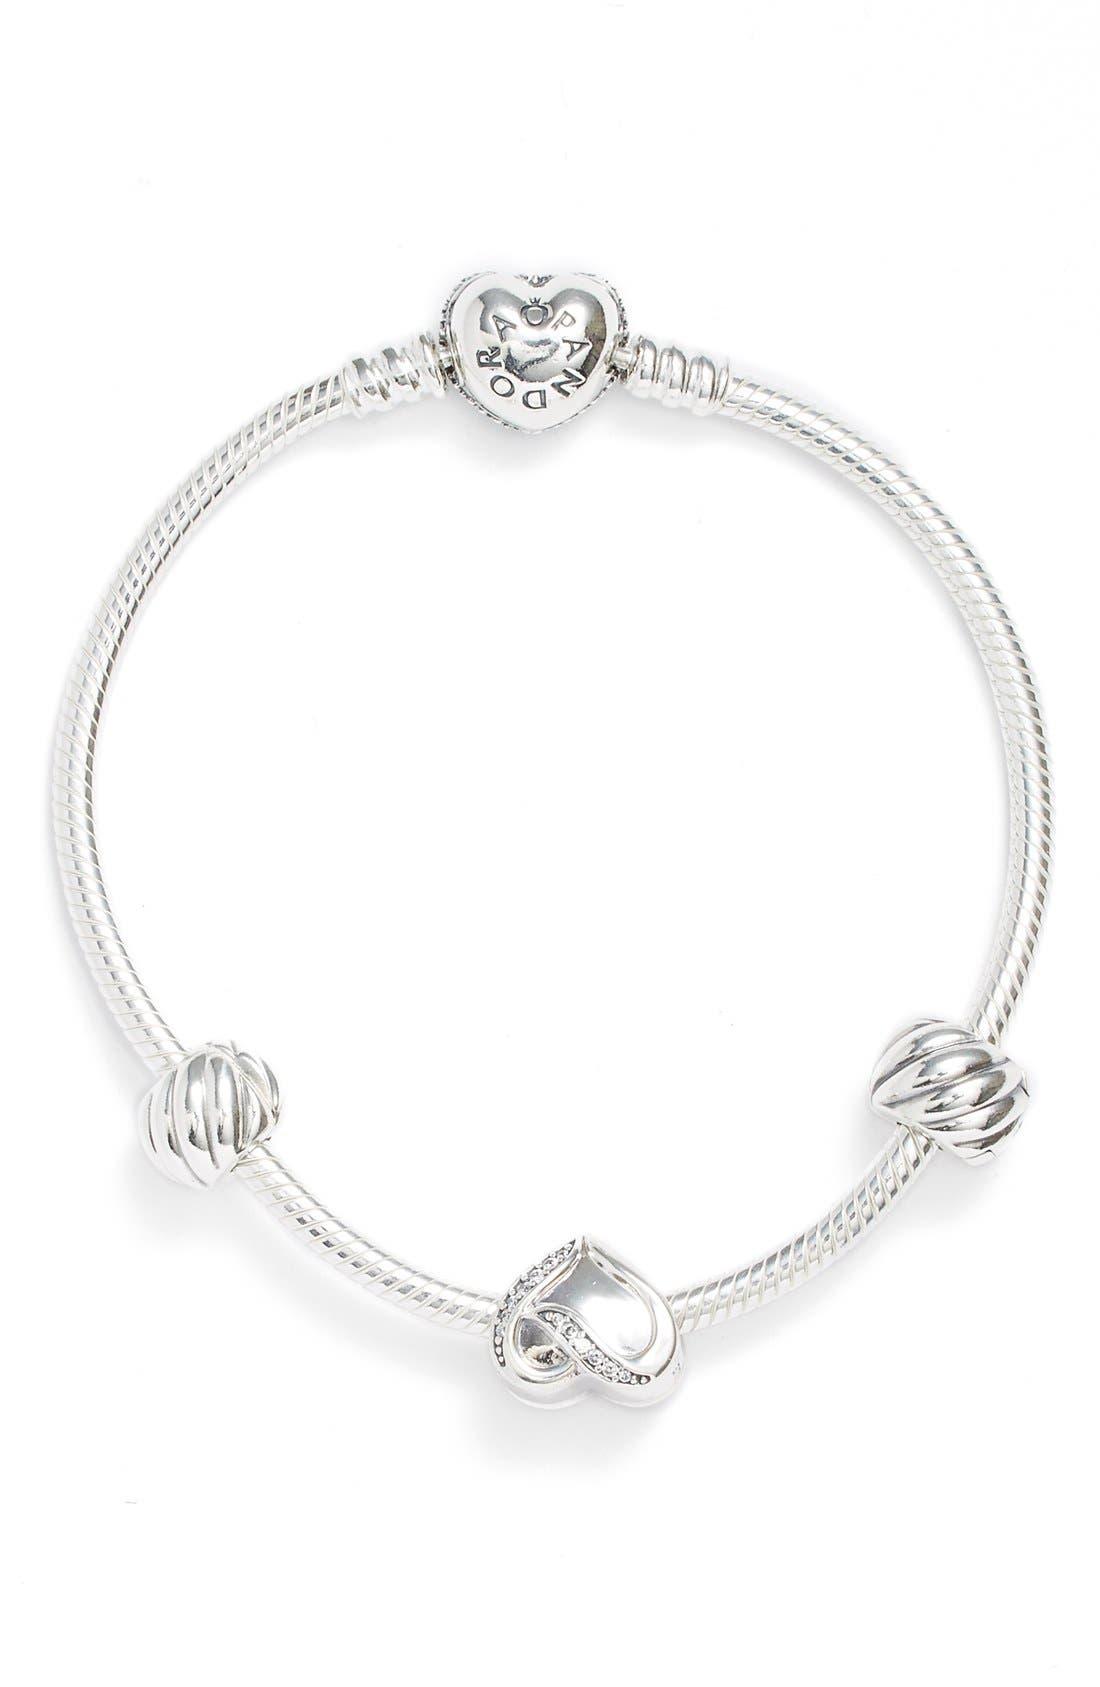 Main Image - PANDORA 'Filled with Love' Bracelet Gift Set